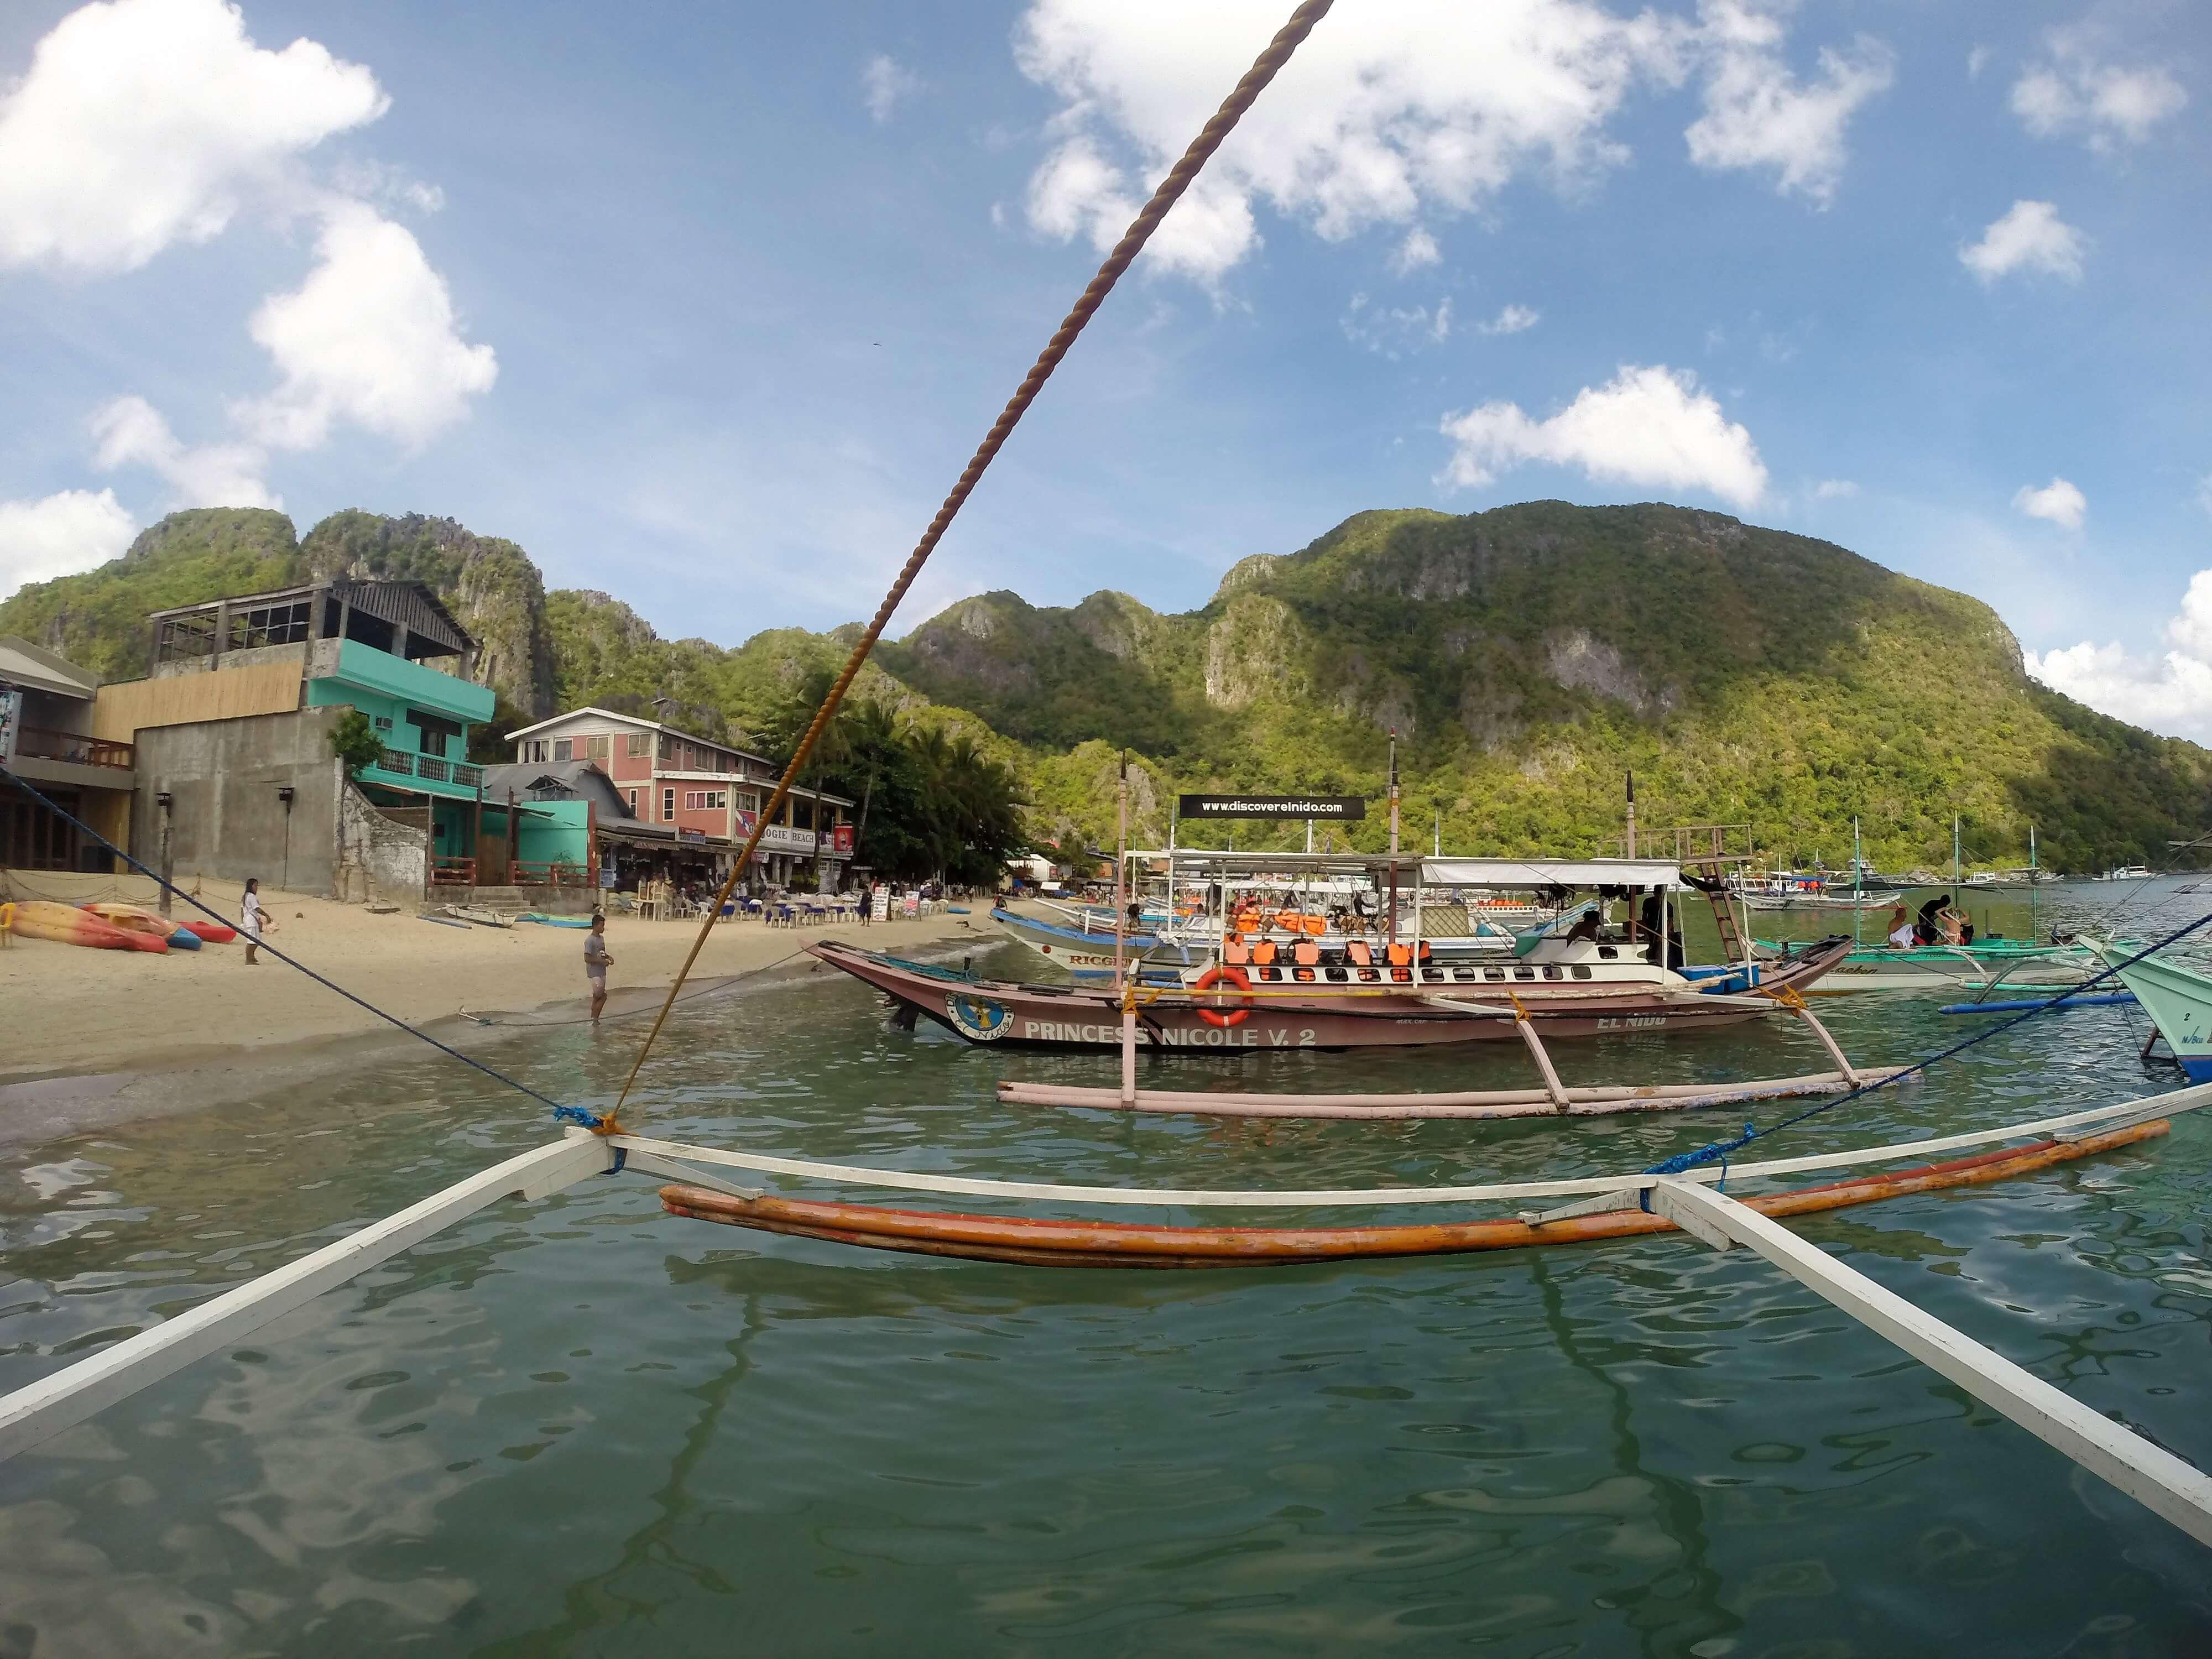 El Nido Philippinen Reiseroute